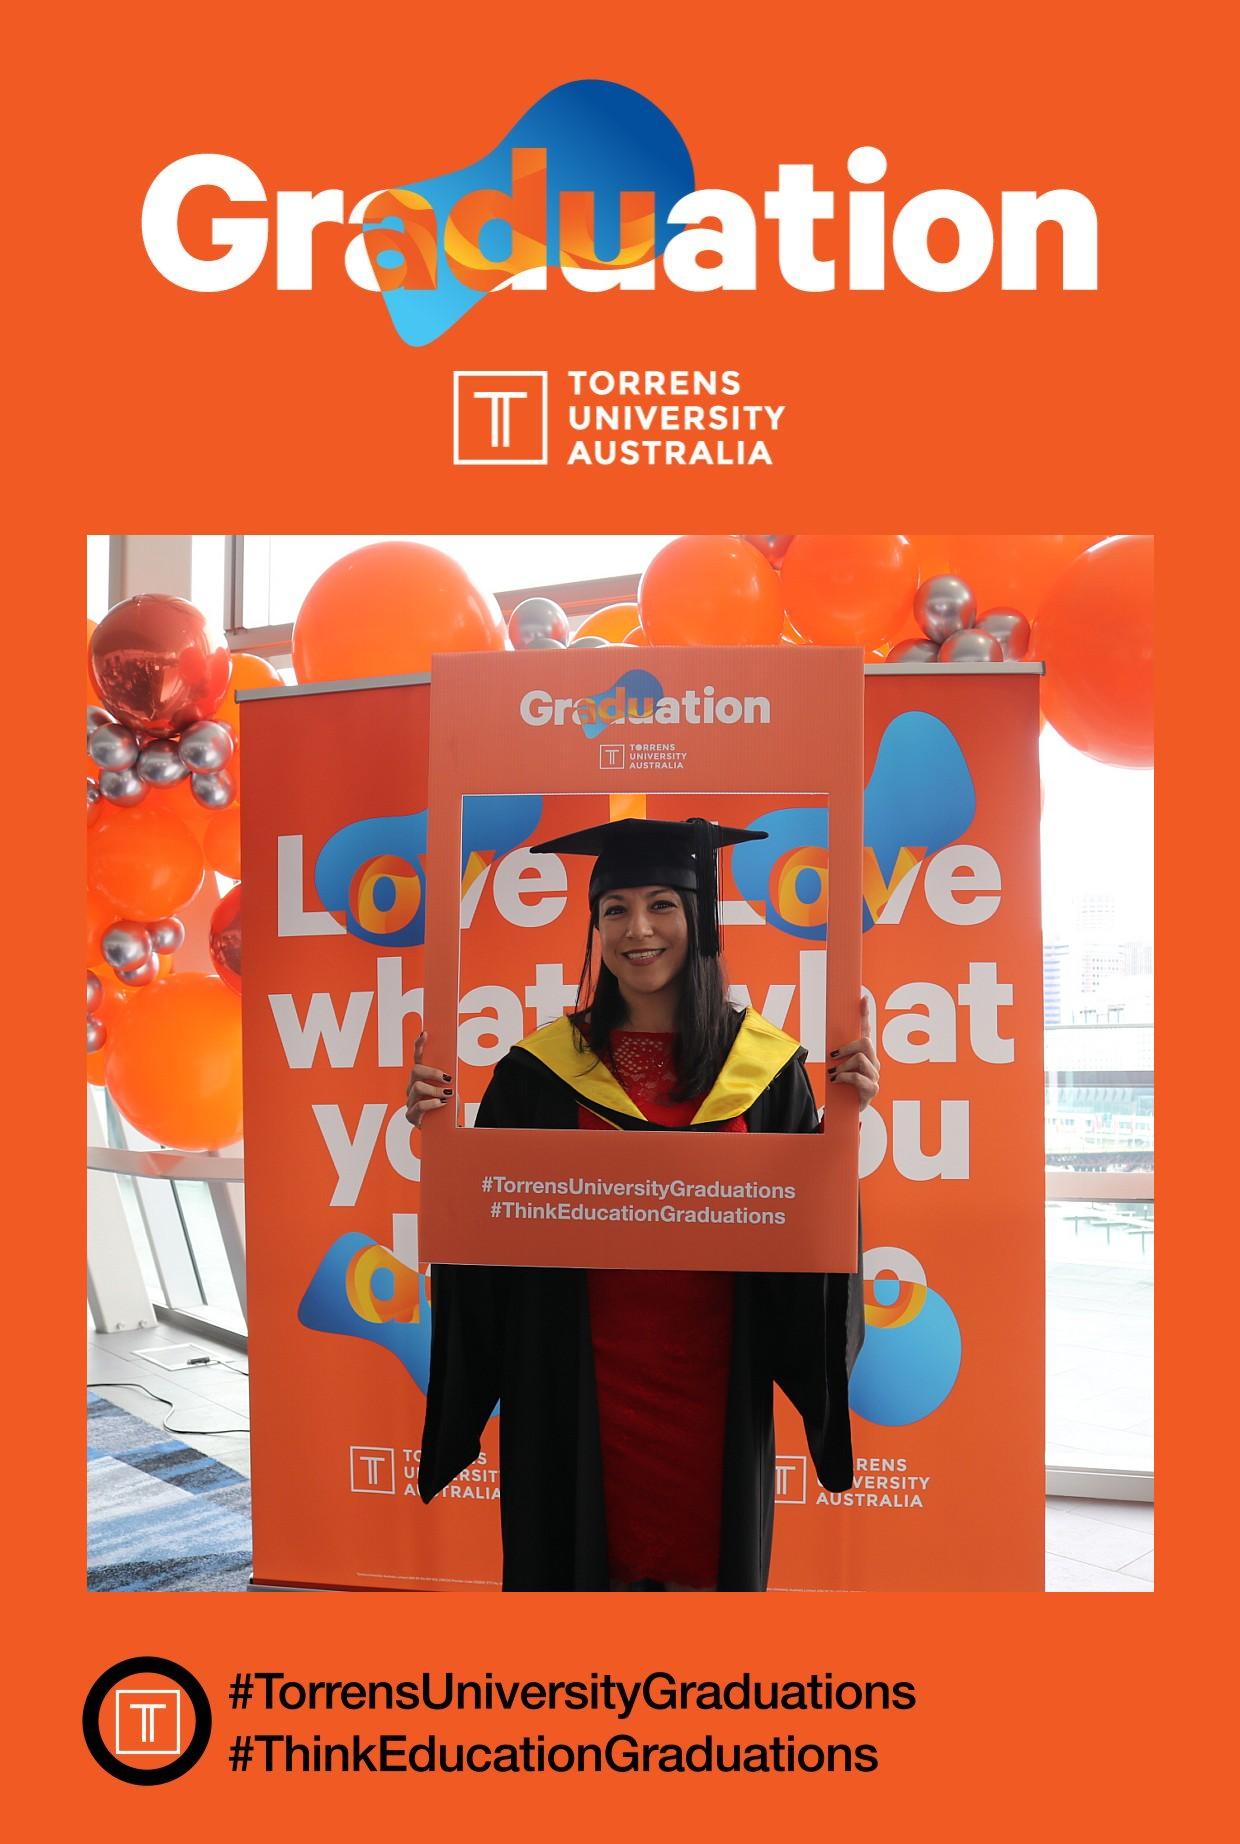 Laureate Graduations